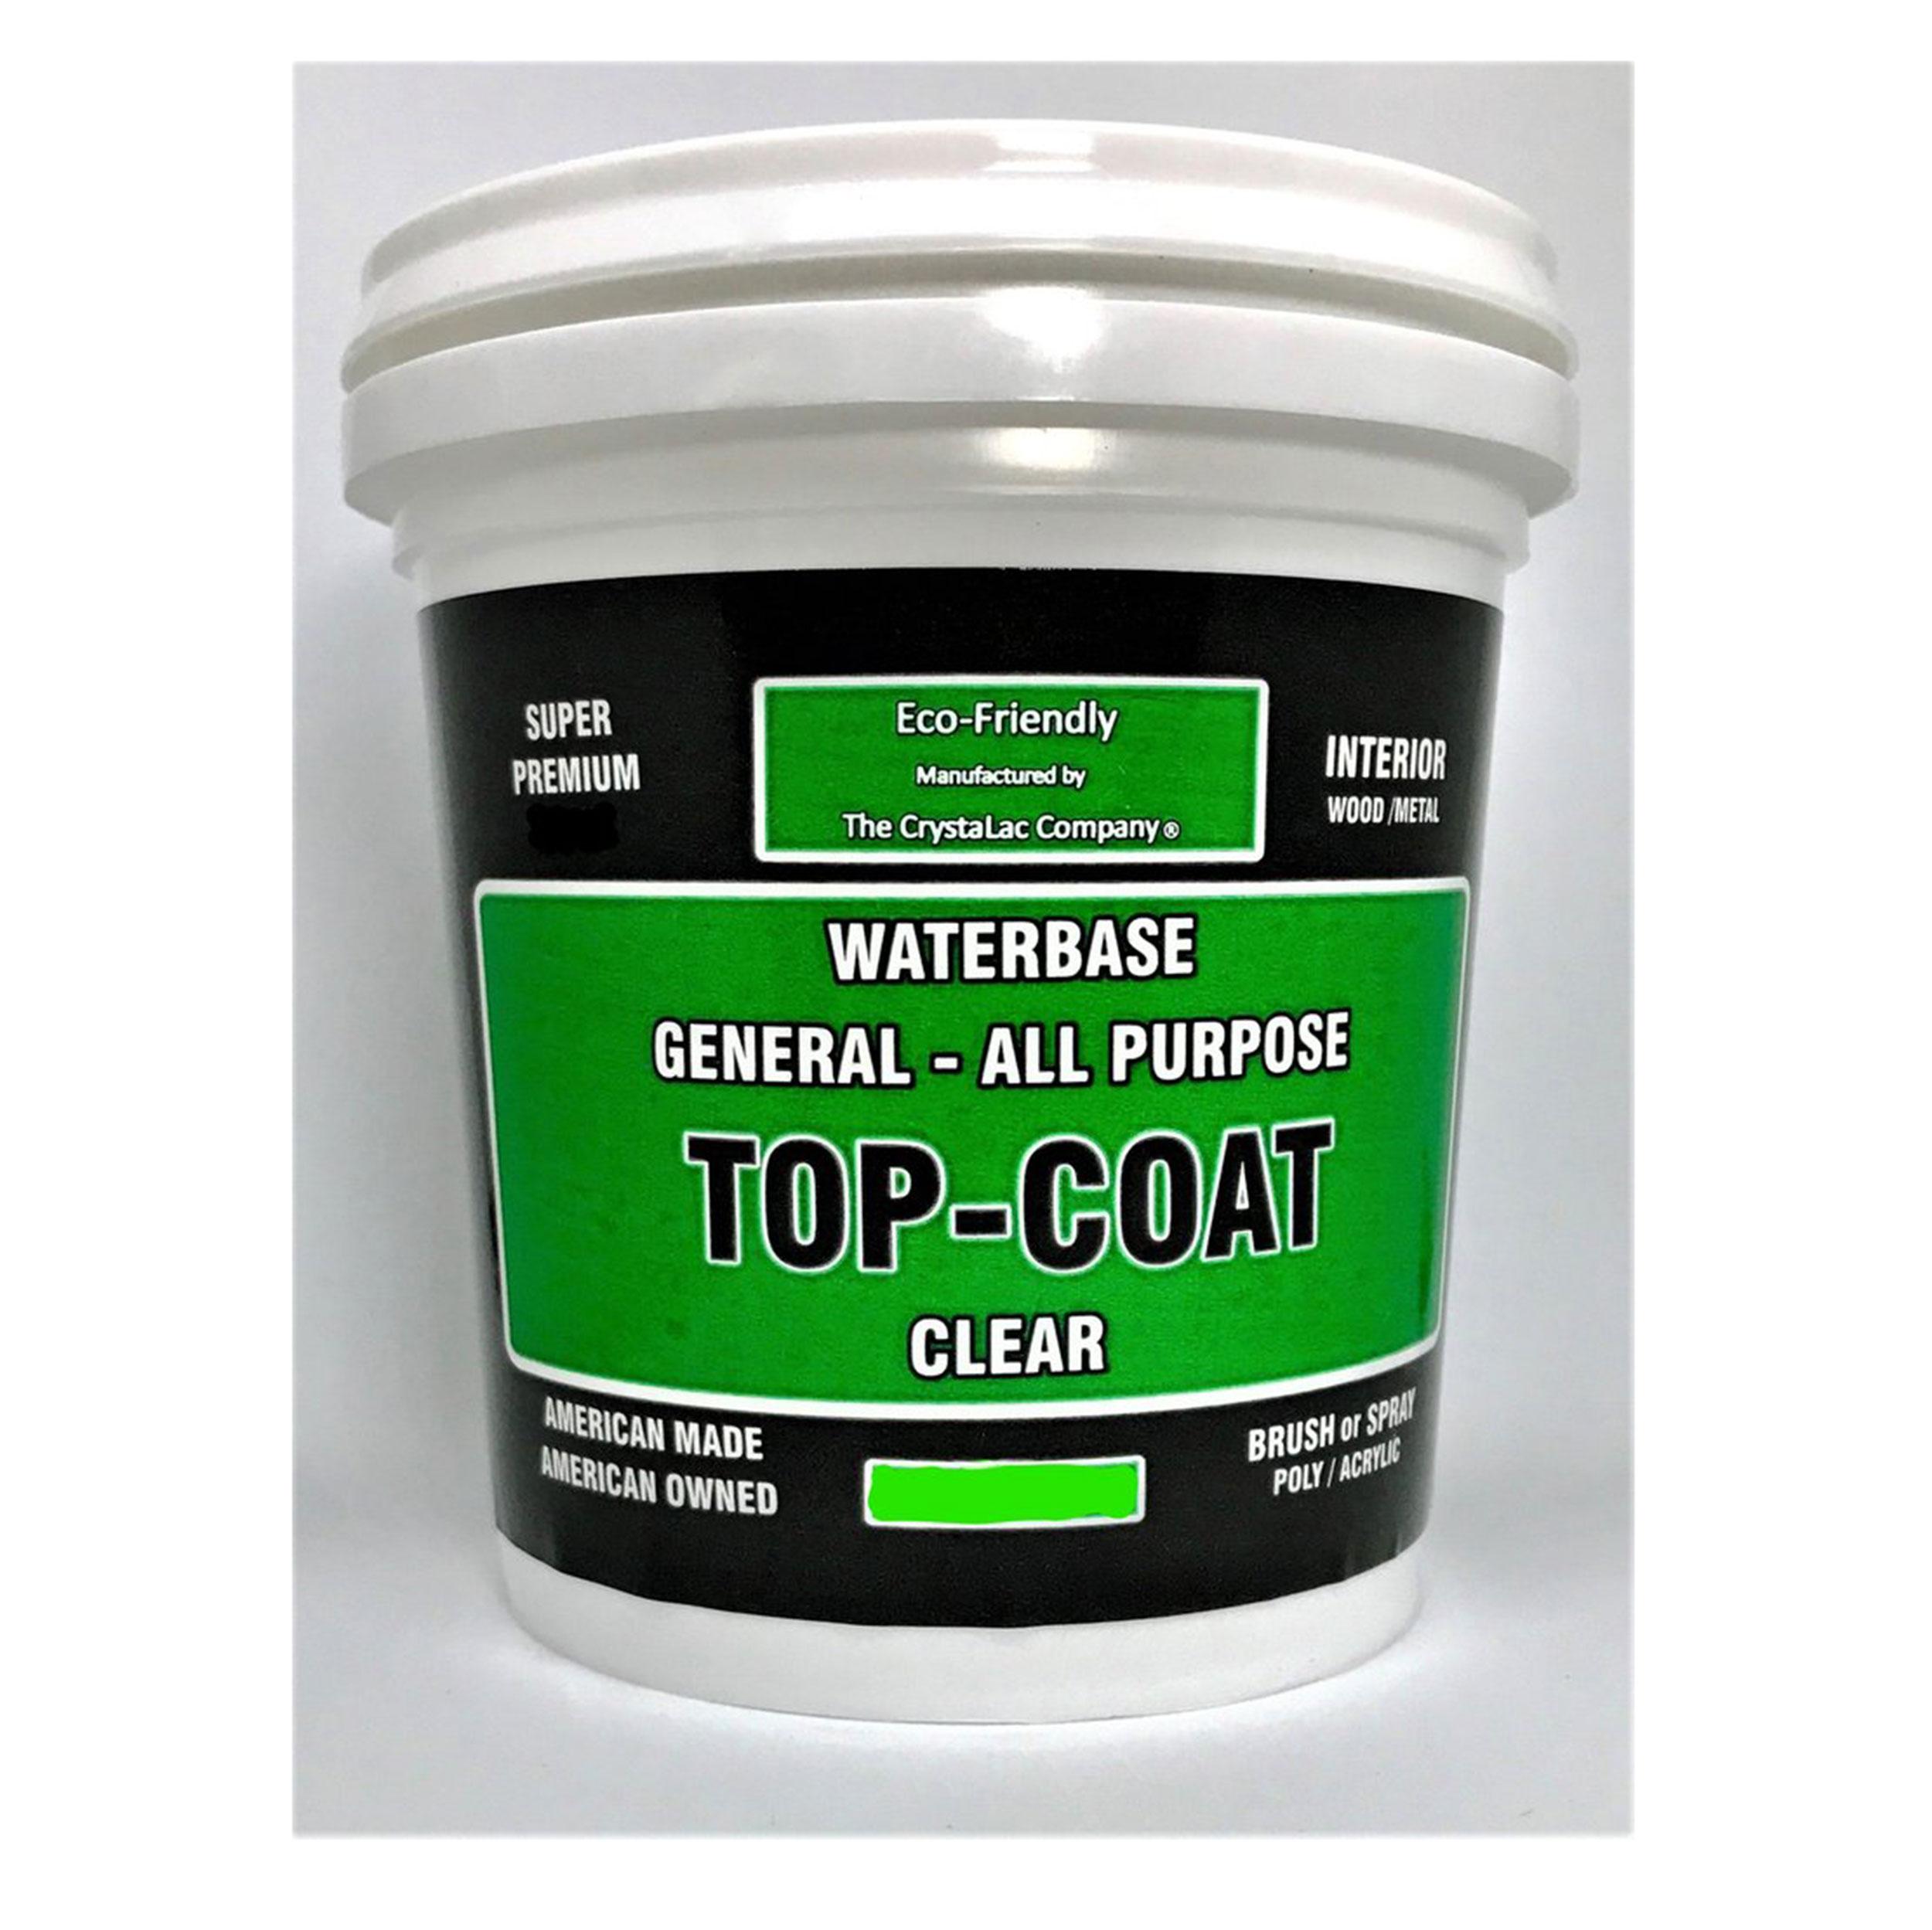 Super Premium General All Purpose Top-Coat Semi-Gloss 5 Gallon Pail